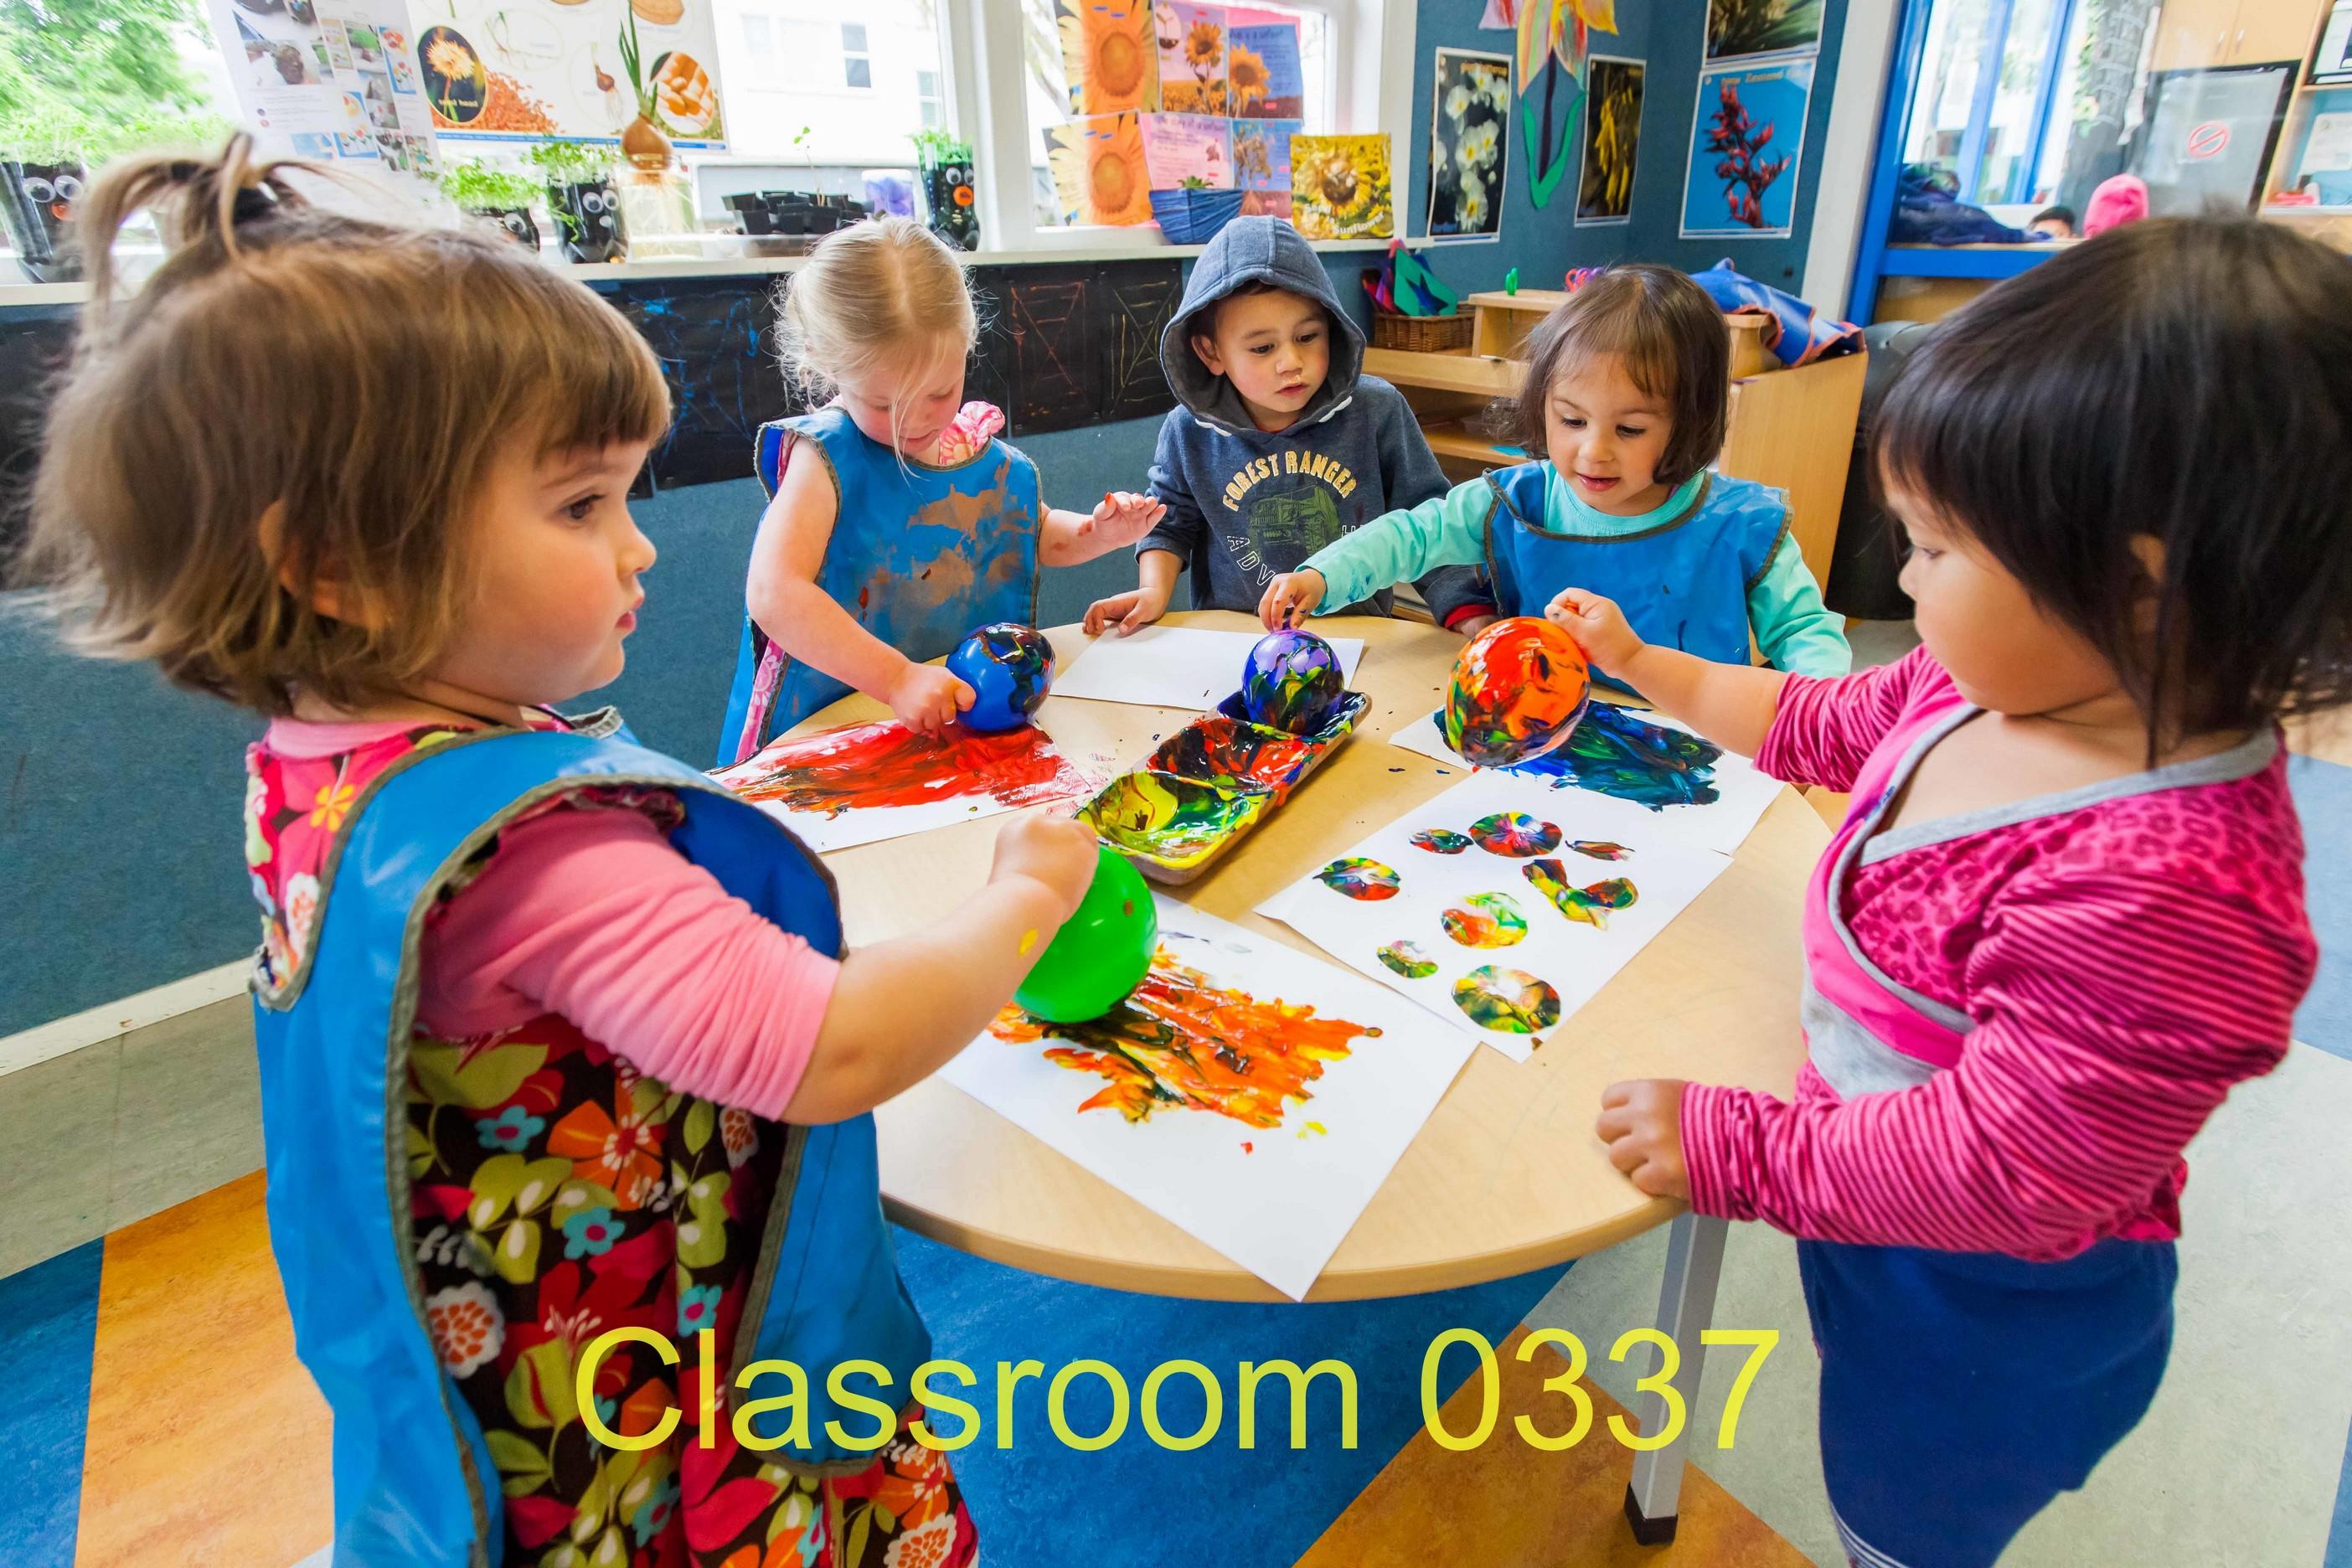 Classroom 0337